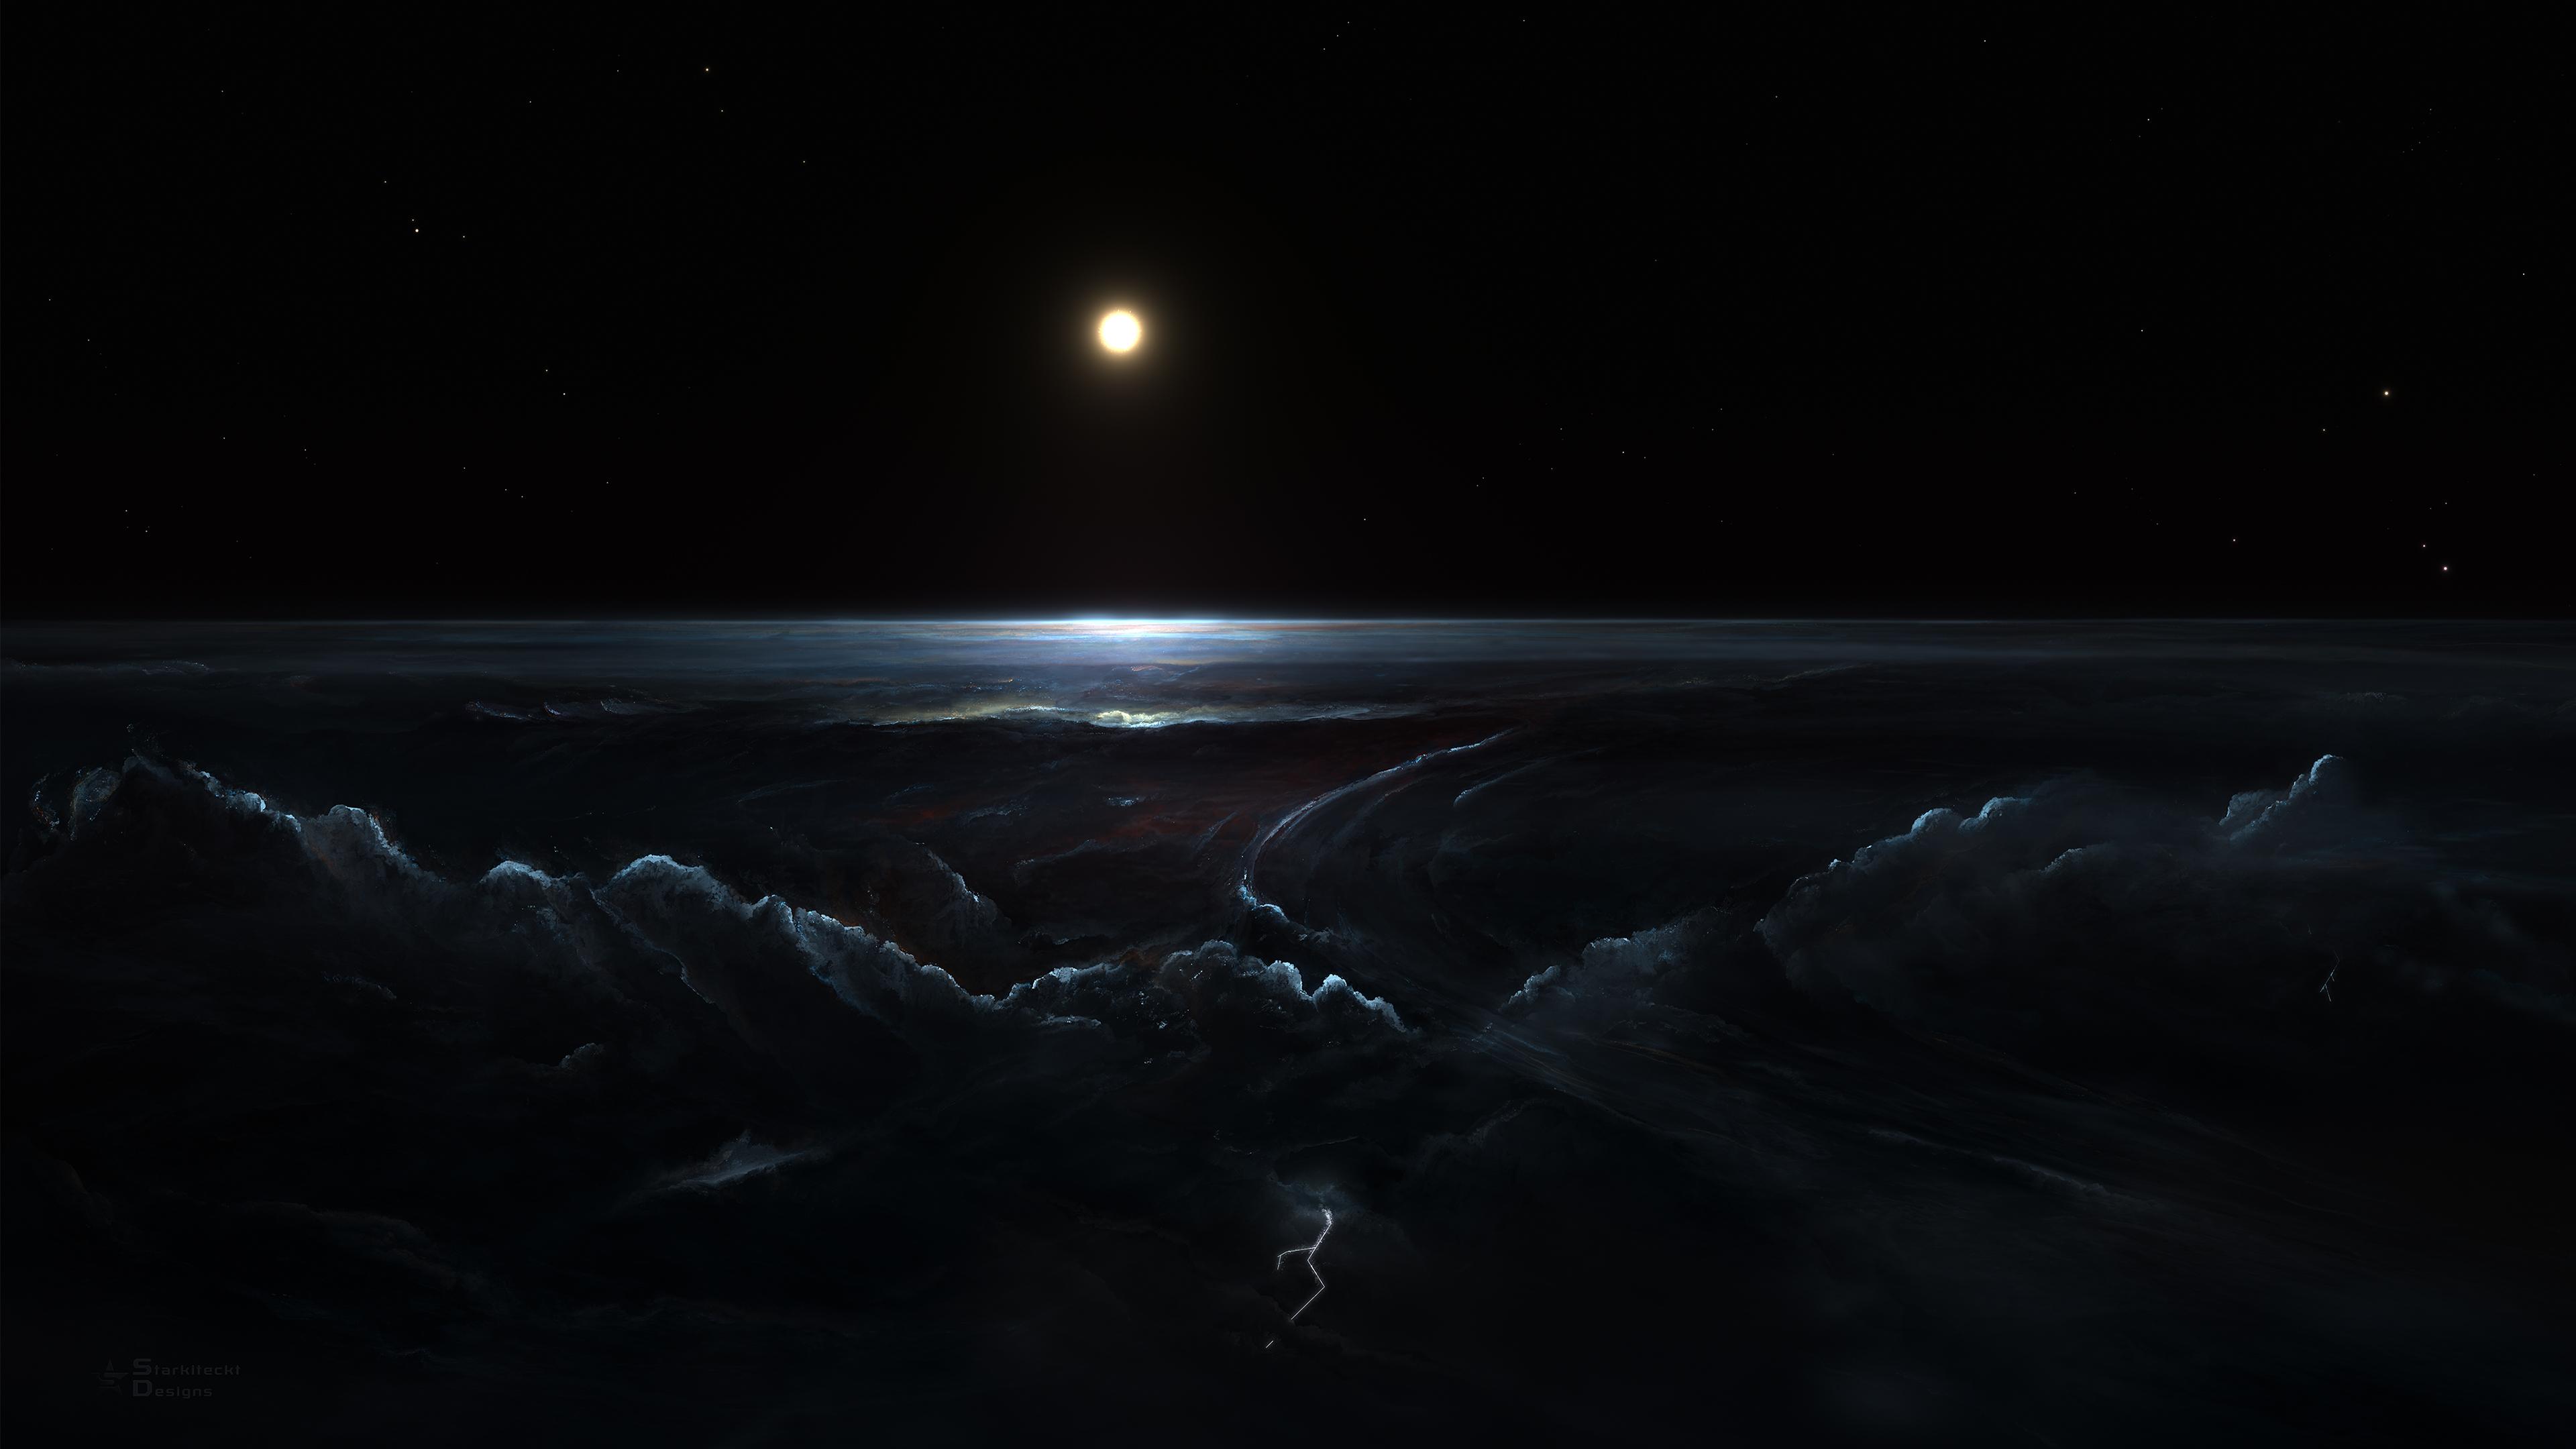 General 3840x2160 space Moon galaxy dark stars Sun lightning clouds black